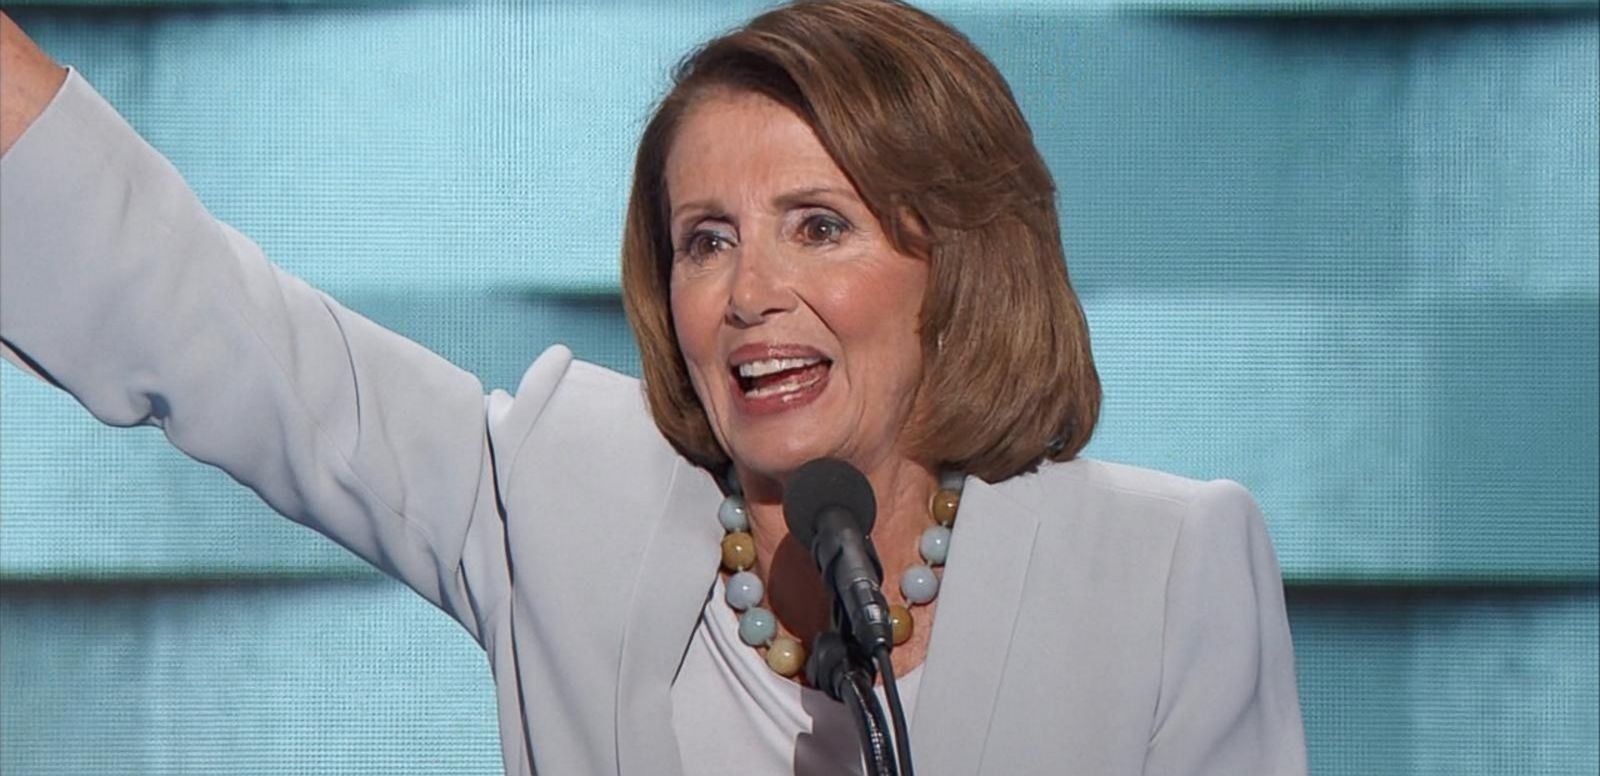 VIDEO: Nancy Pelosi Tells Assembled Democrats to Look 'Onward to Victory'